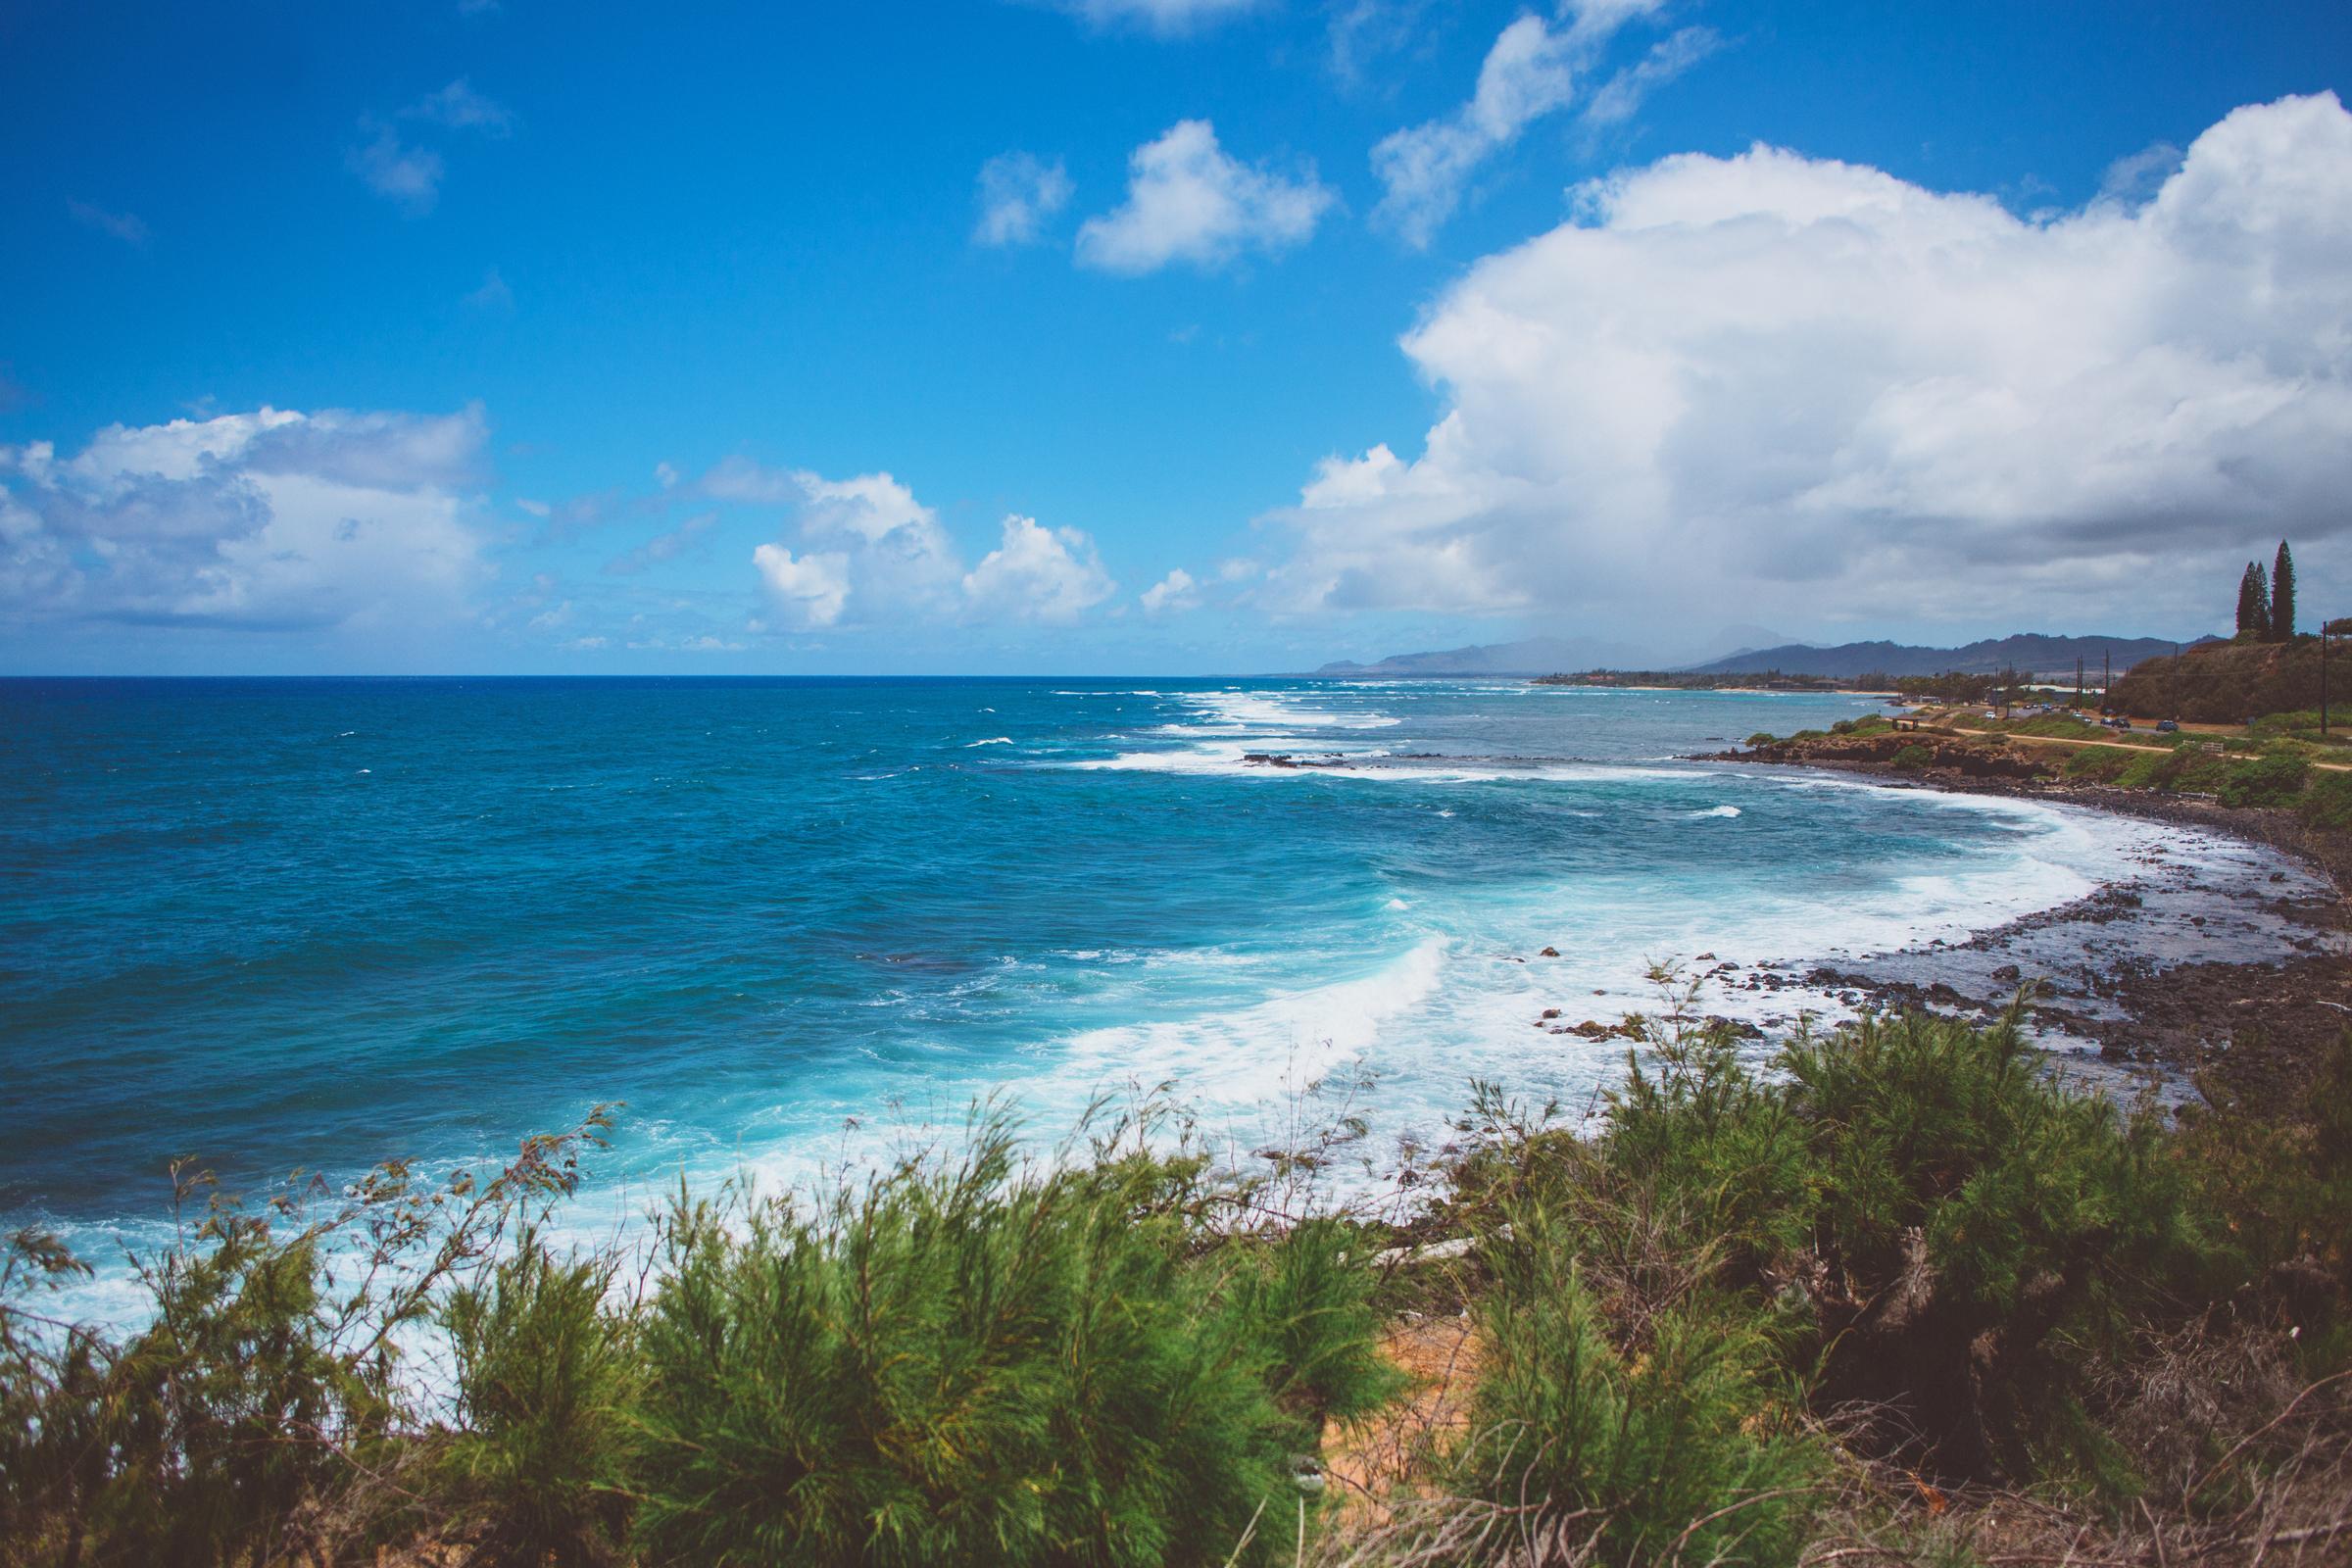 IMG_2207-KAUAI-HAWAII-JENNIFER-PICARD-PHOTOGRAPHY.jpg